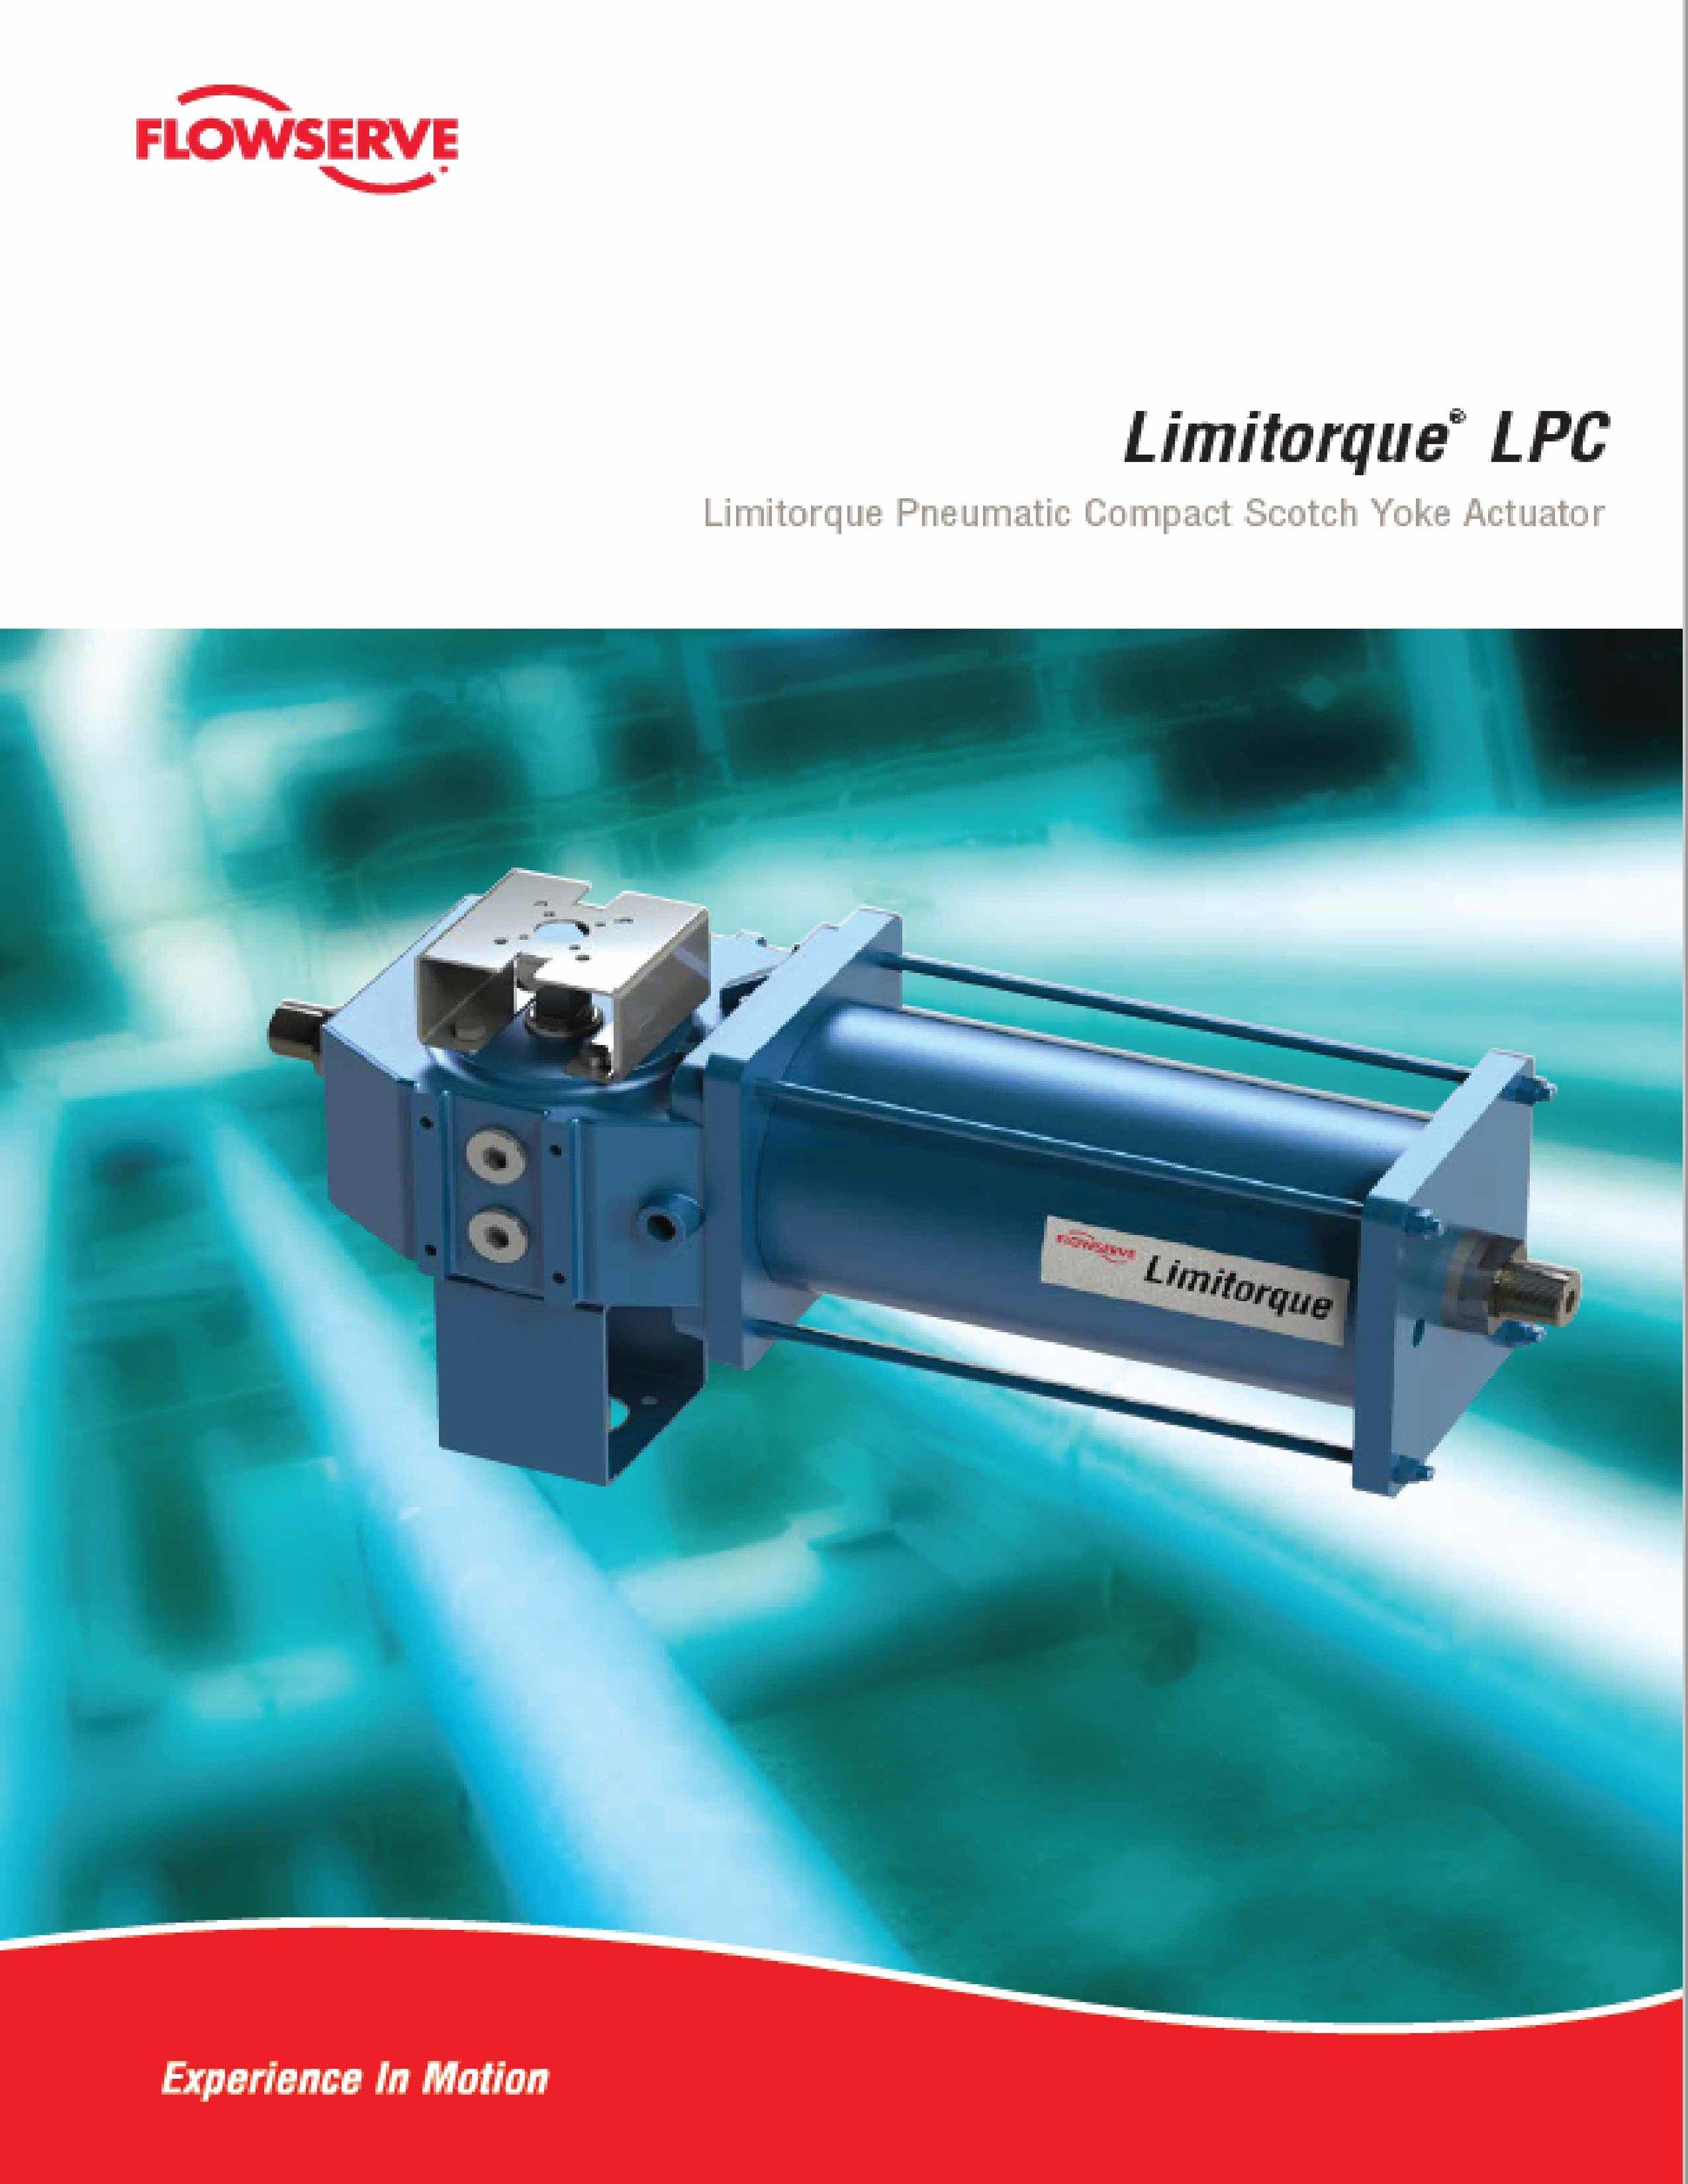 Limitorque_LPC_pneumatic-brochure-01.jpg